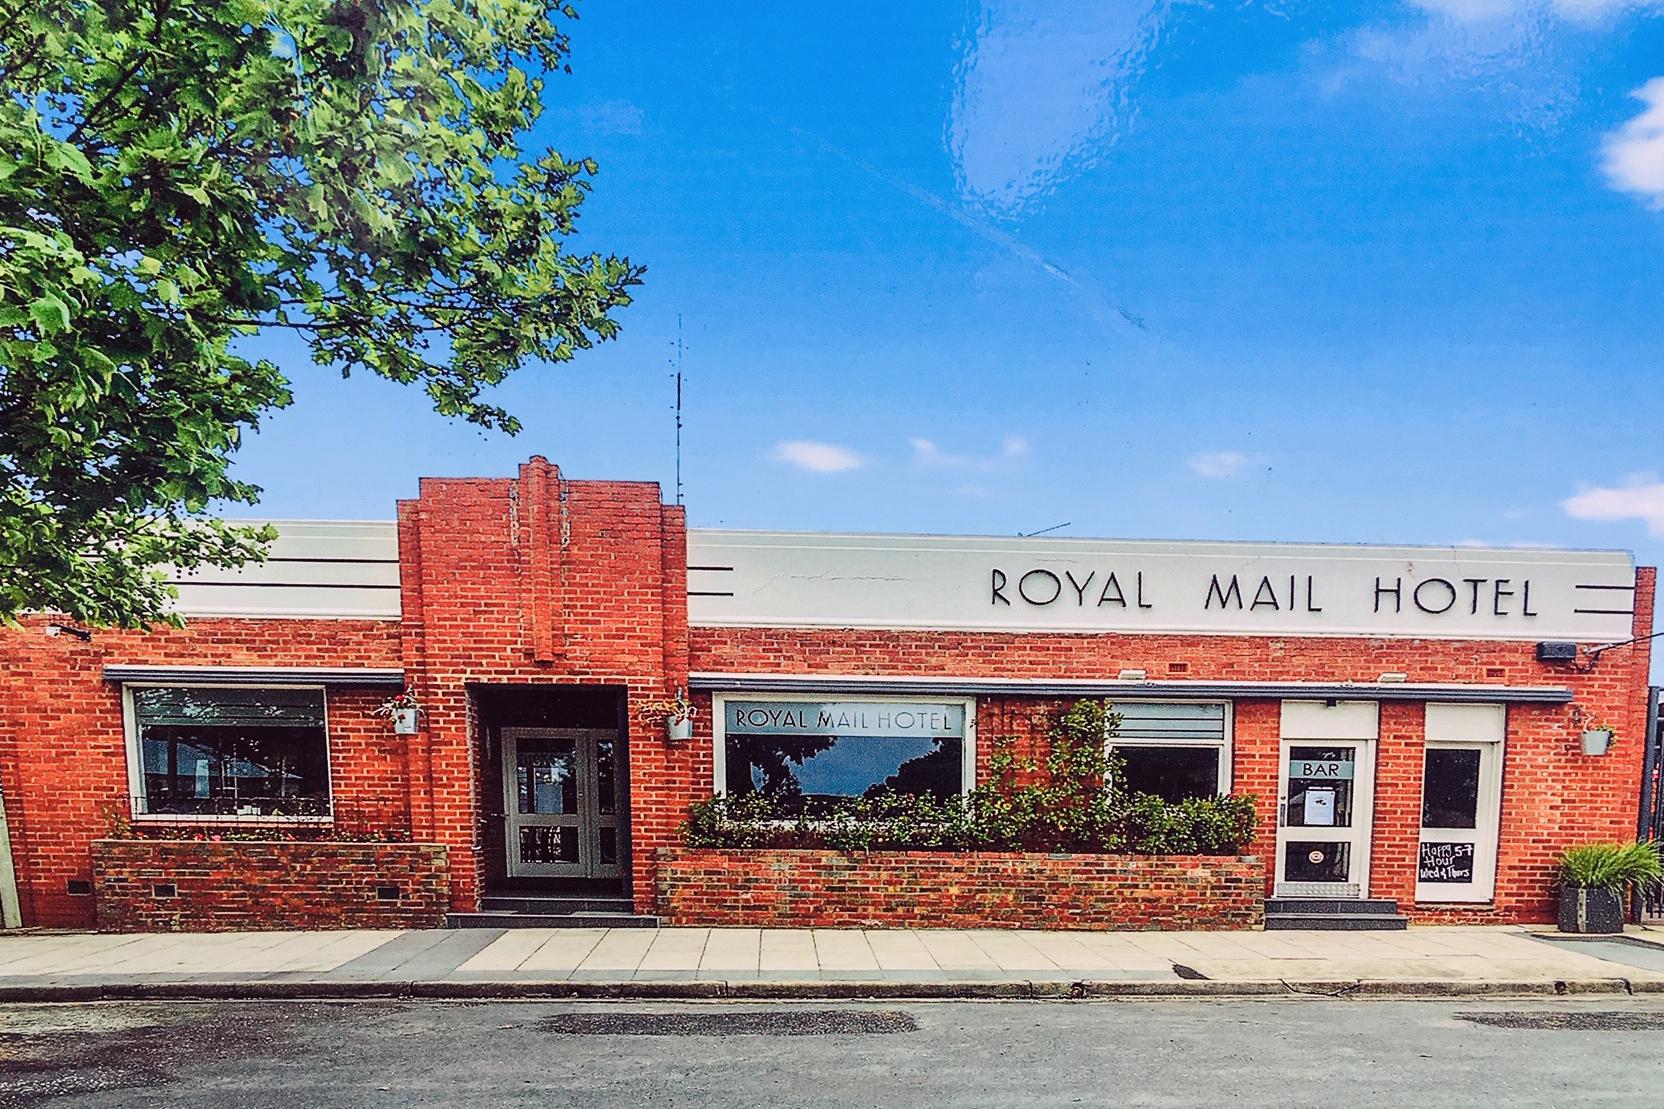 m - Royal Mail Hotel